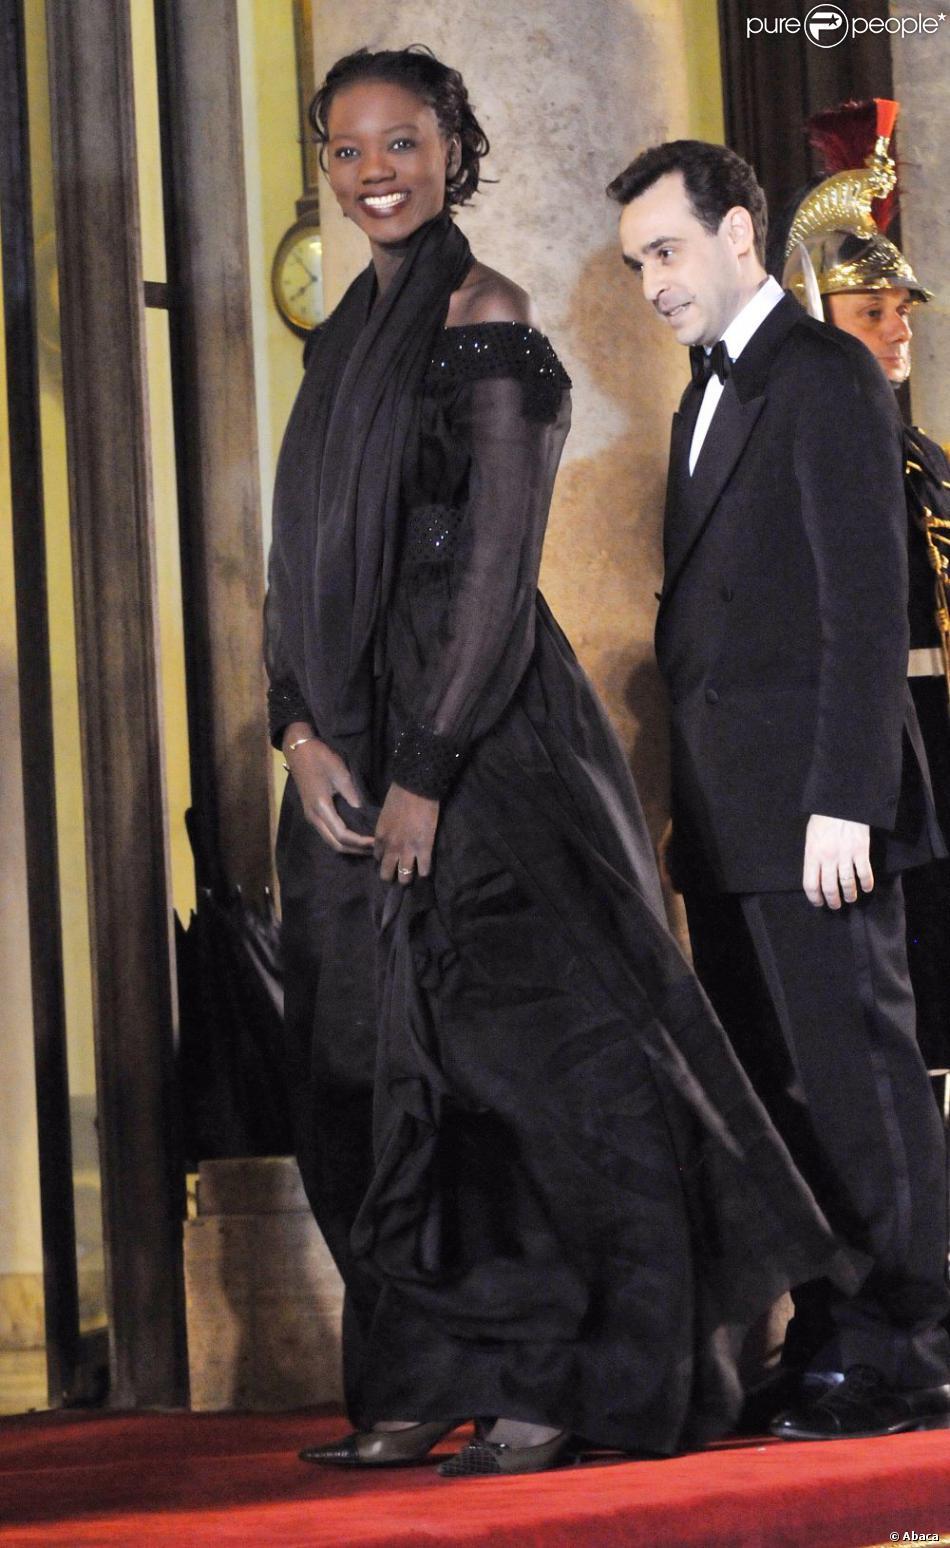 Rama yade et son mari joseph zimet paris le 10 mars 2008 - Jeanne mas et son mari ...